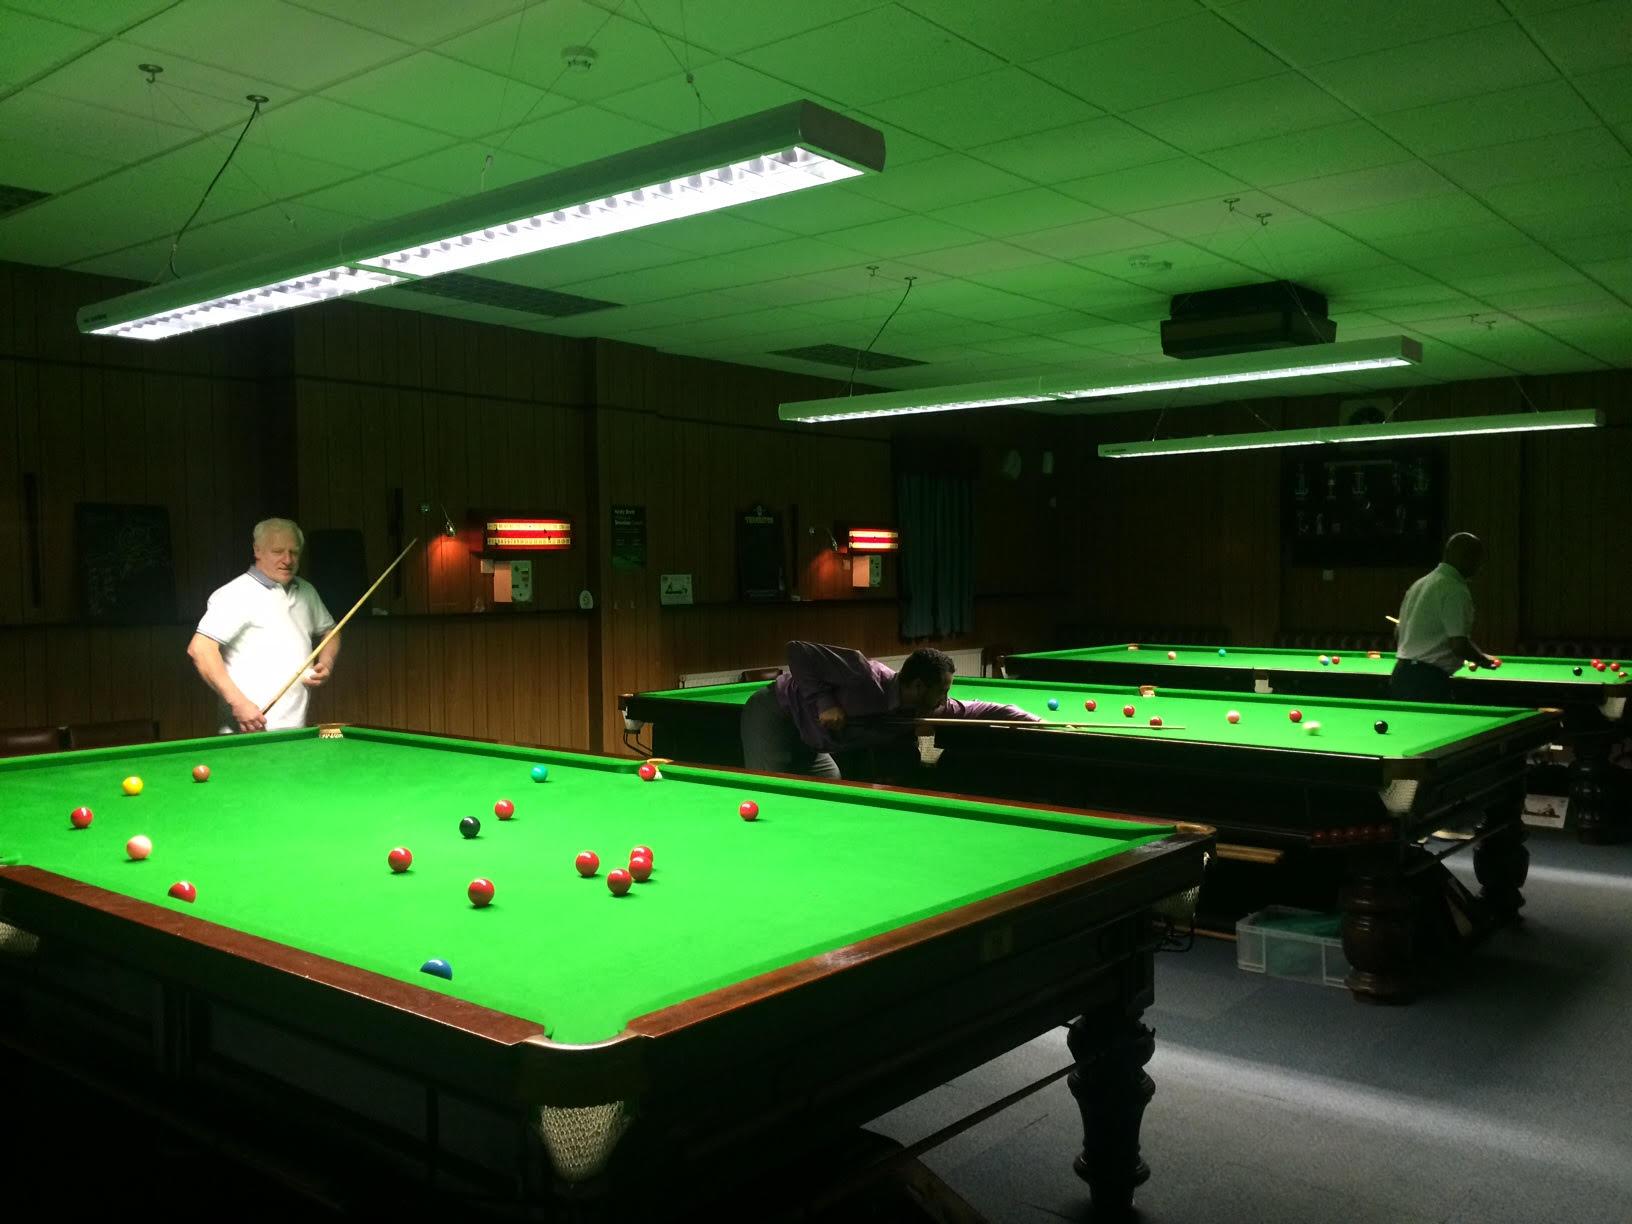 Snooker in Solihull